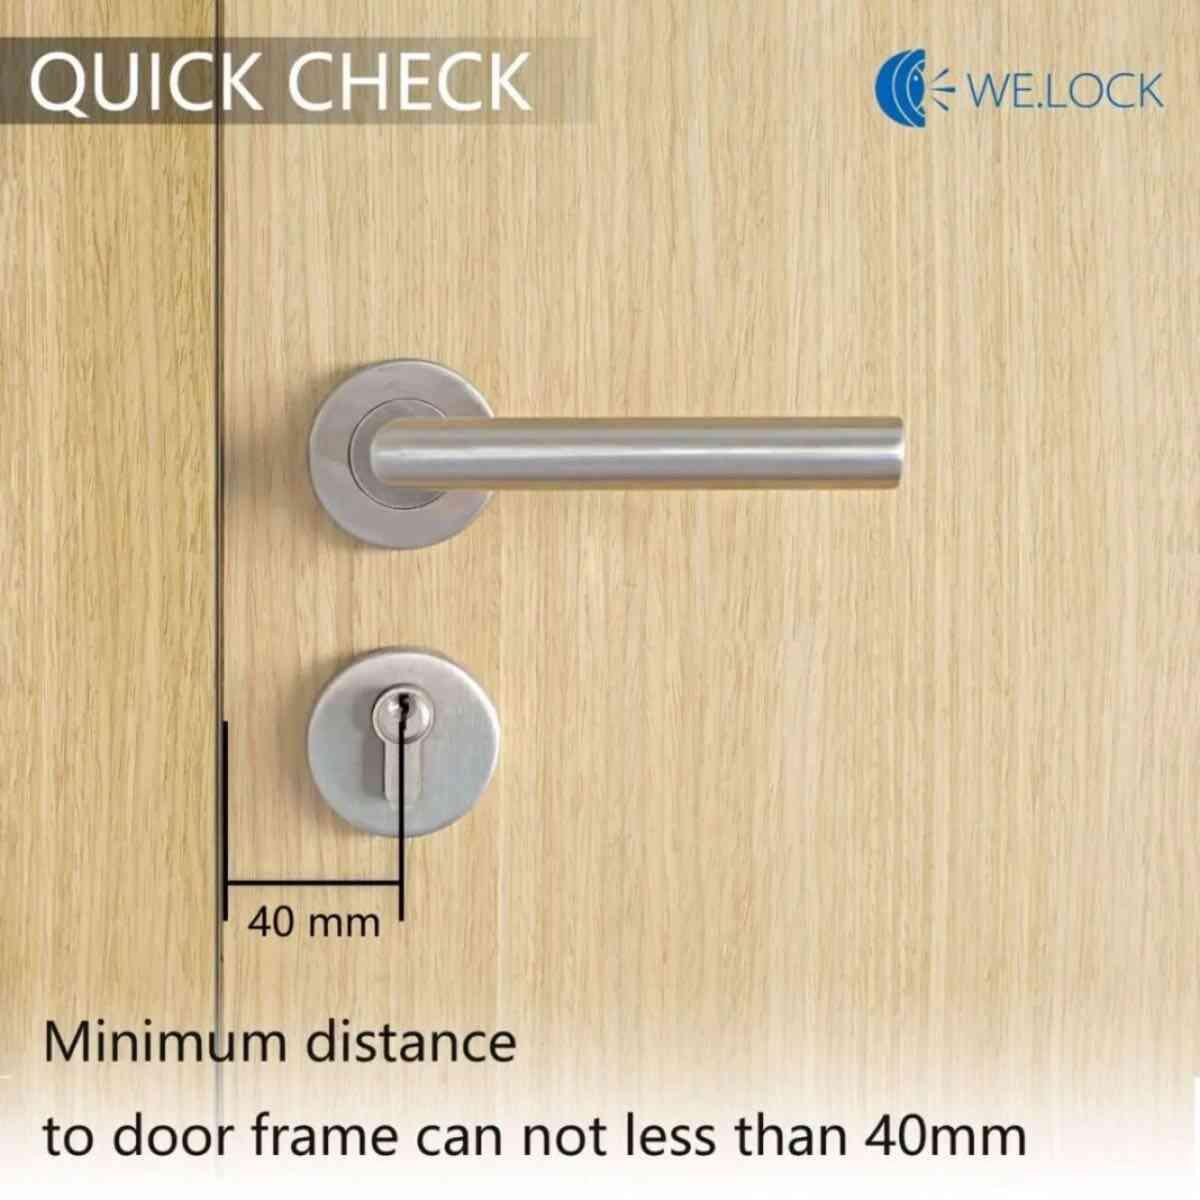 welock serratura smart card guida 2